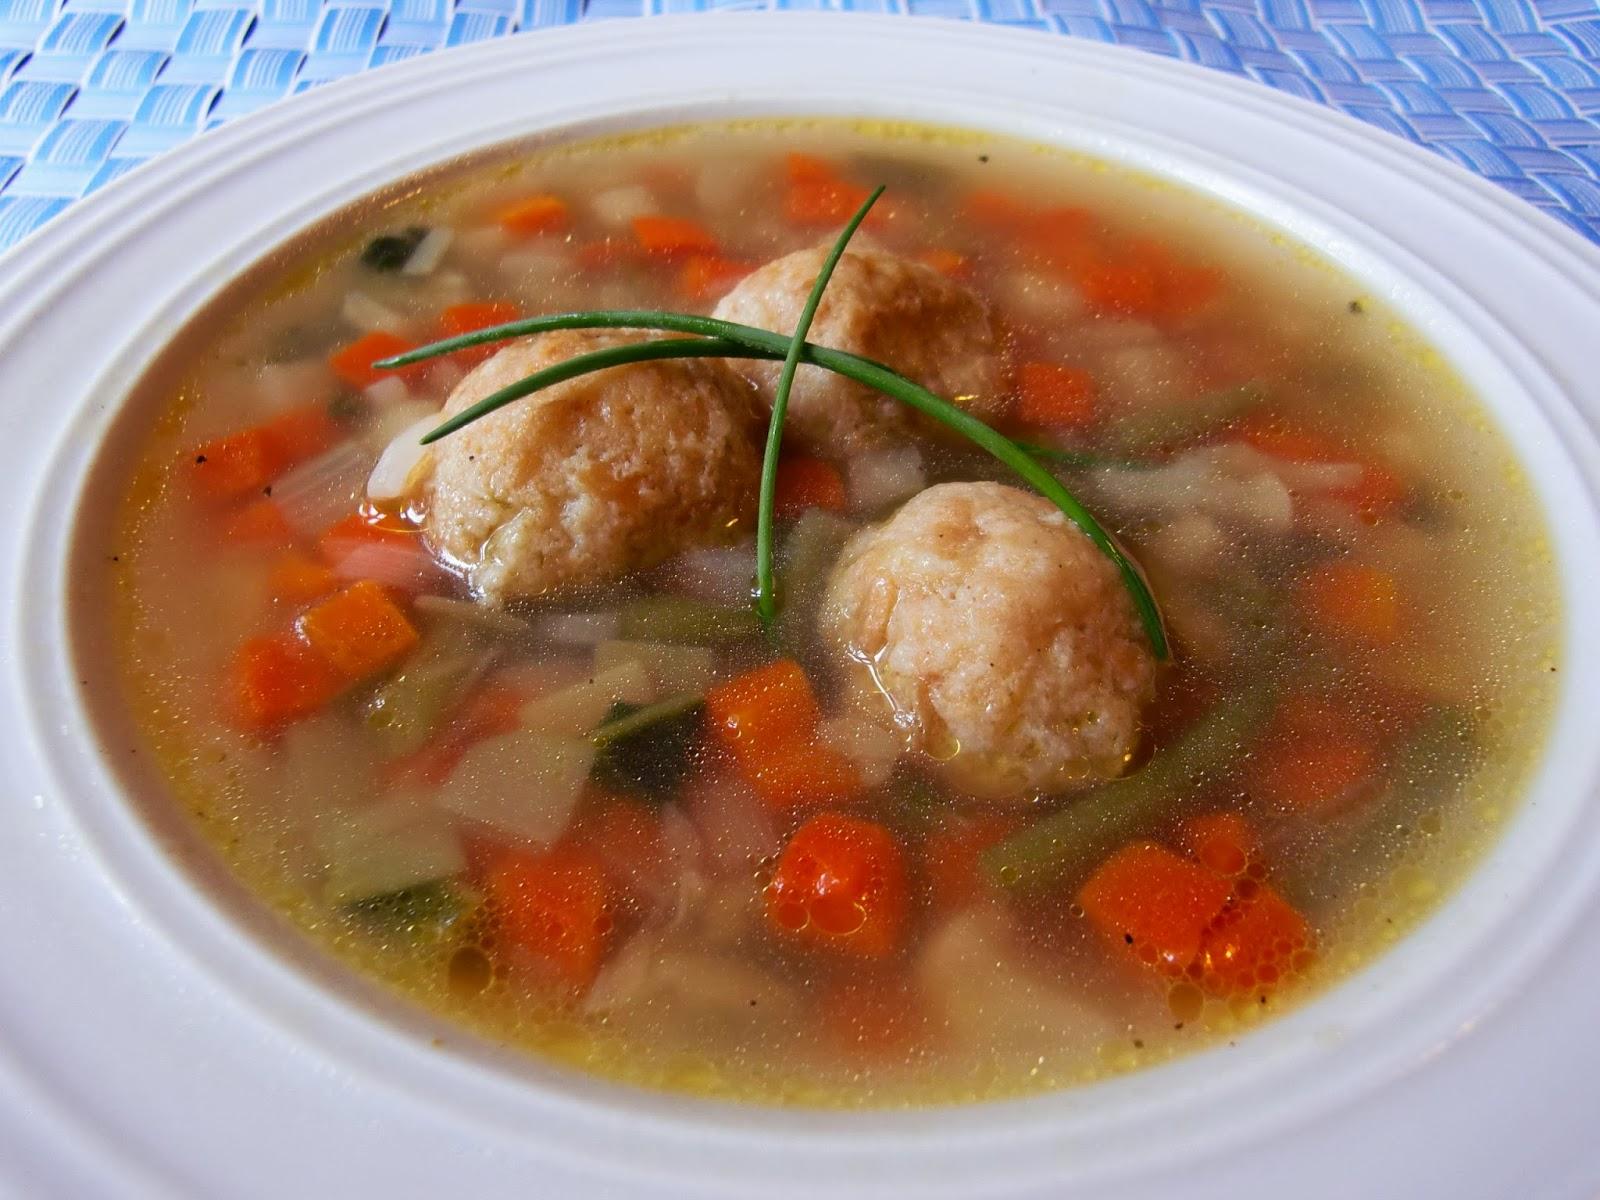 Rezept Gemüsesuppe mit Zwiebackklößchen